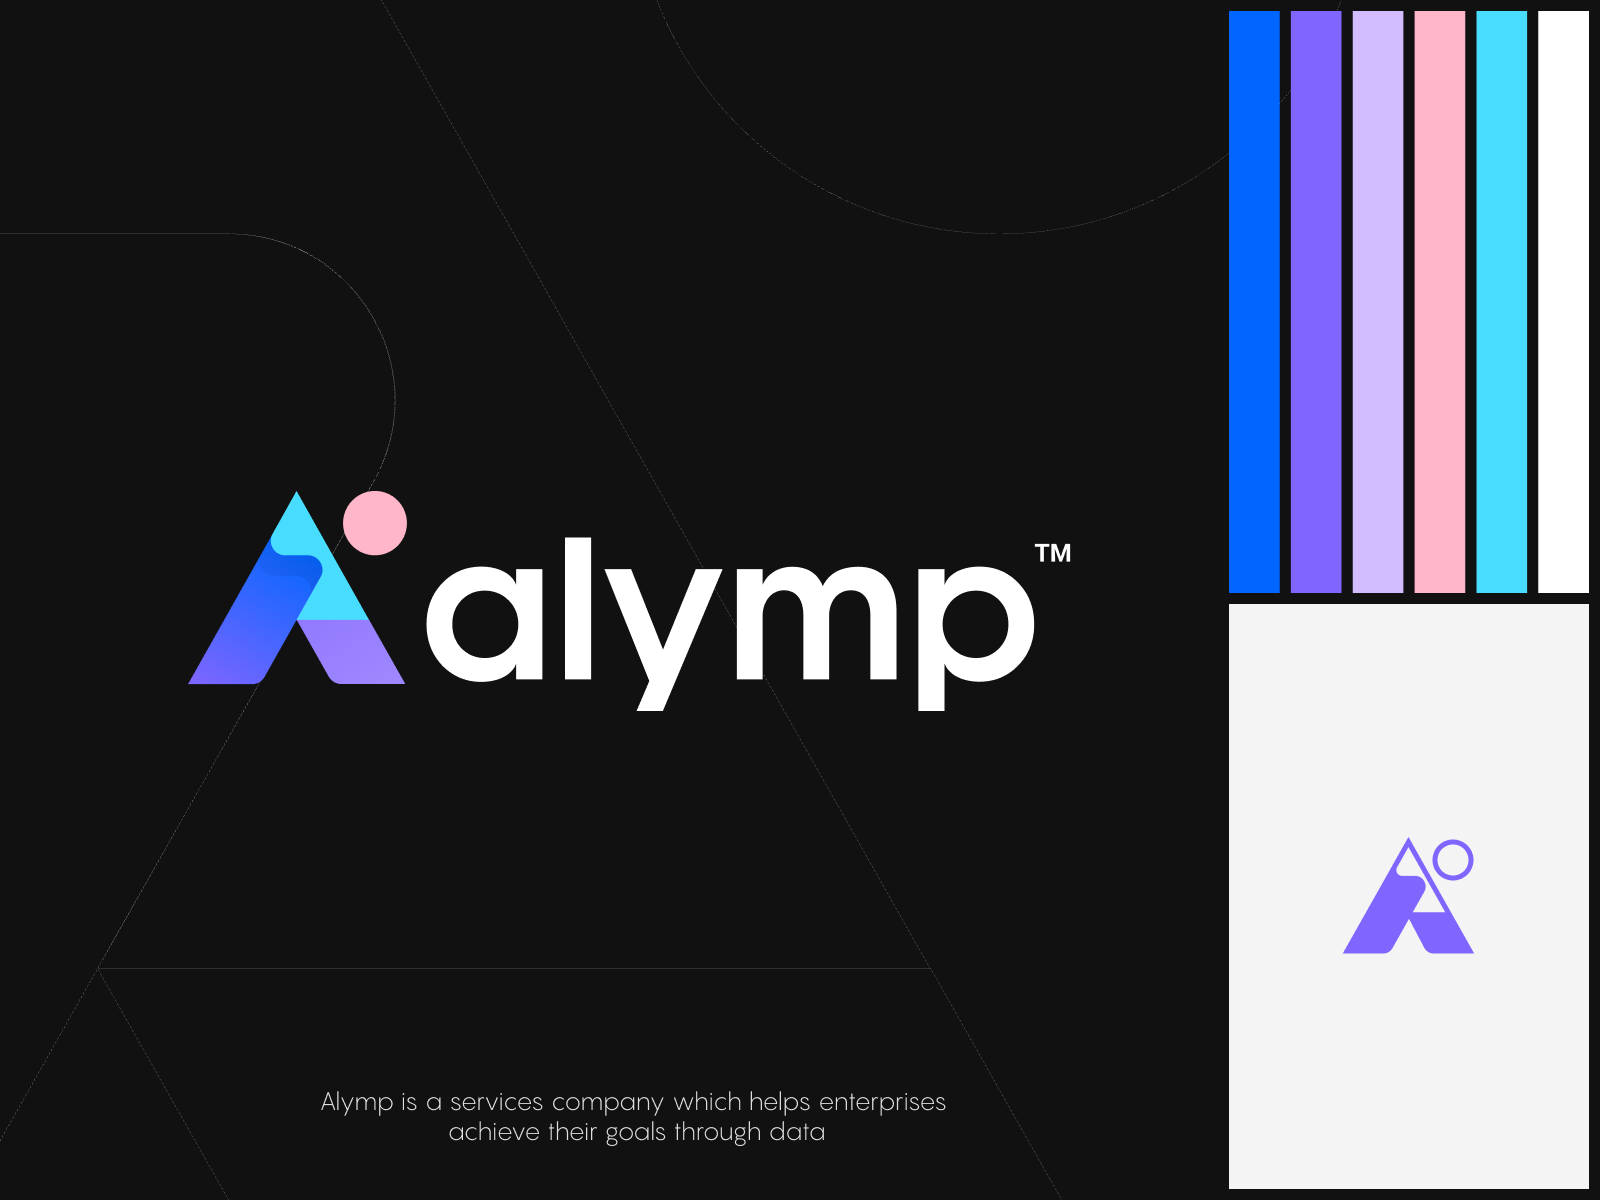 Alymp Logo Design